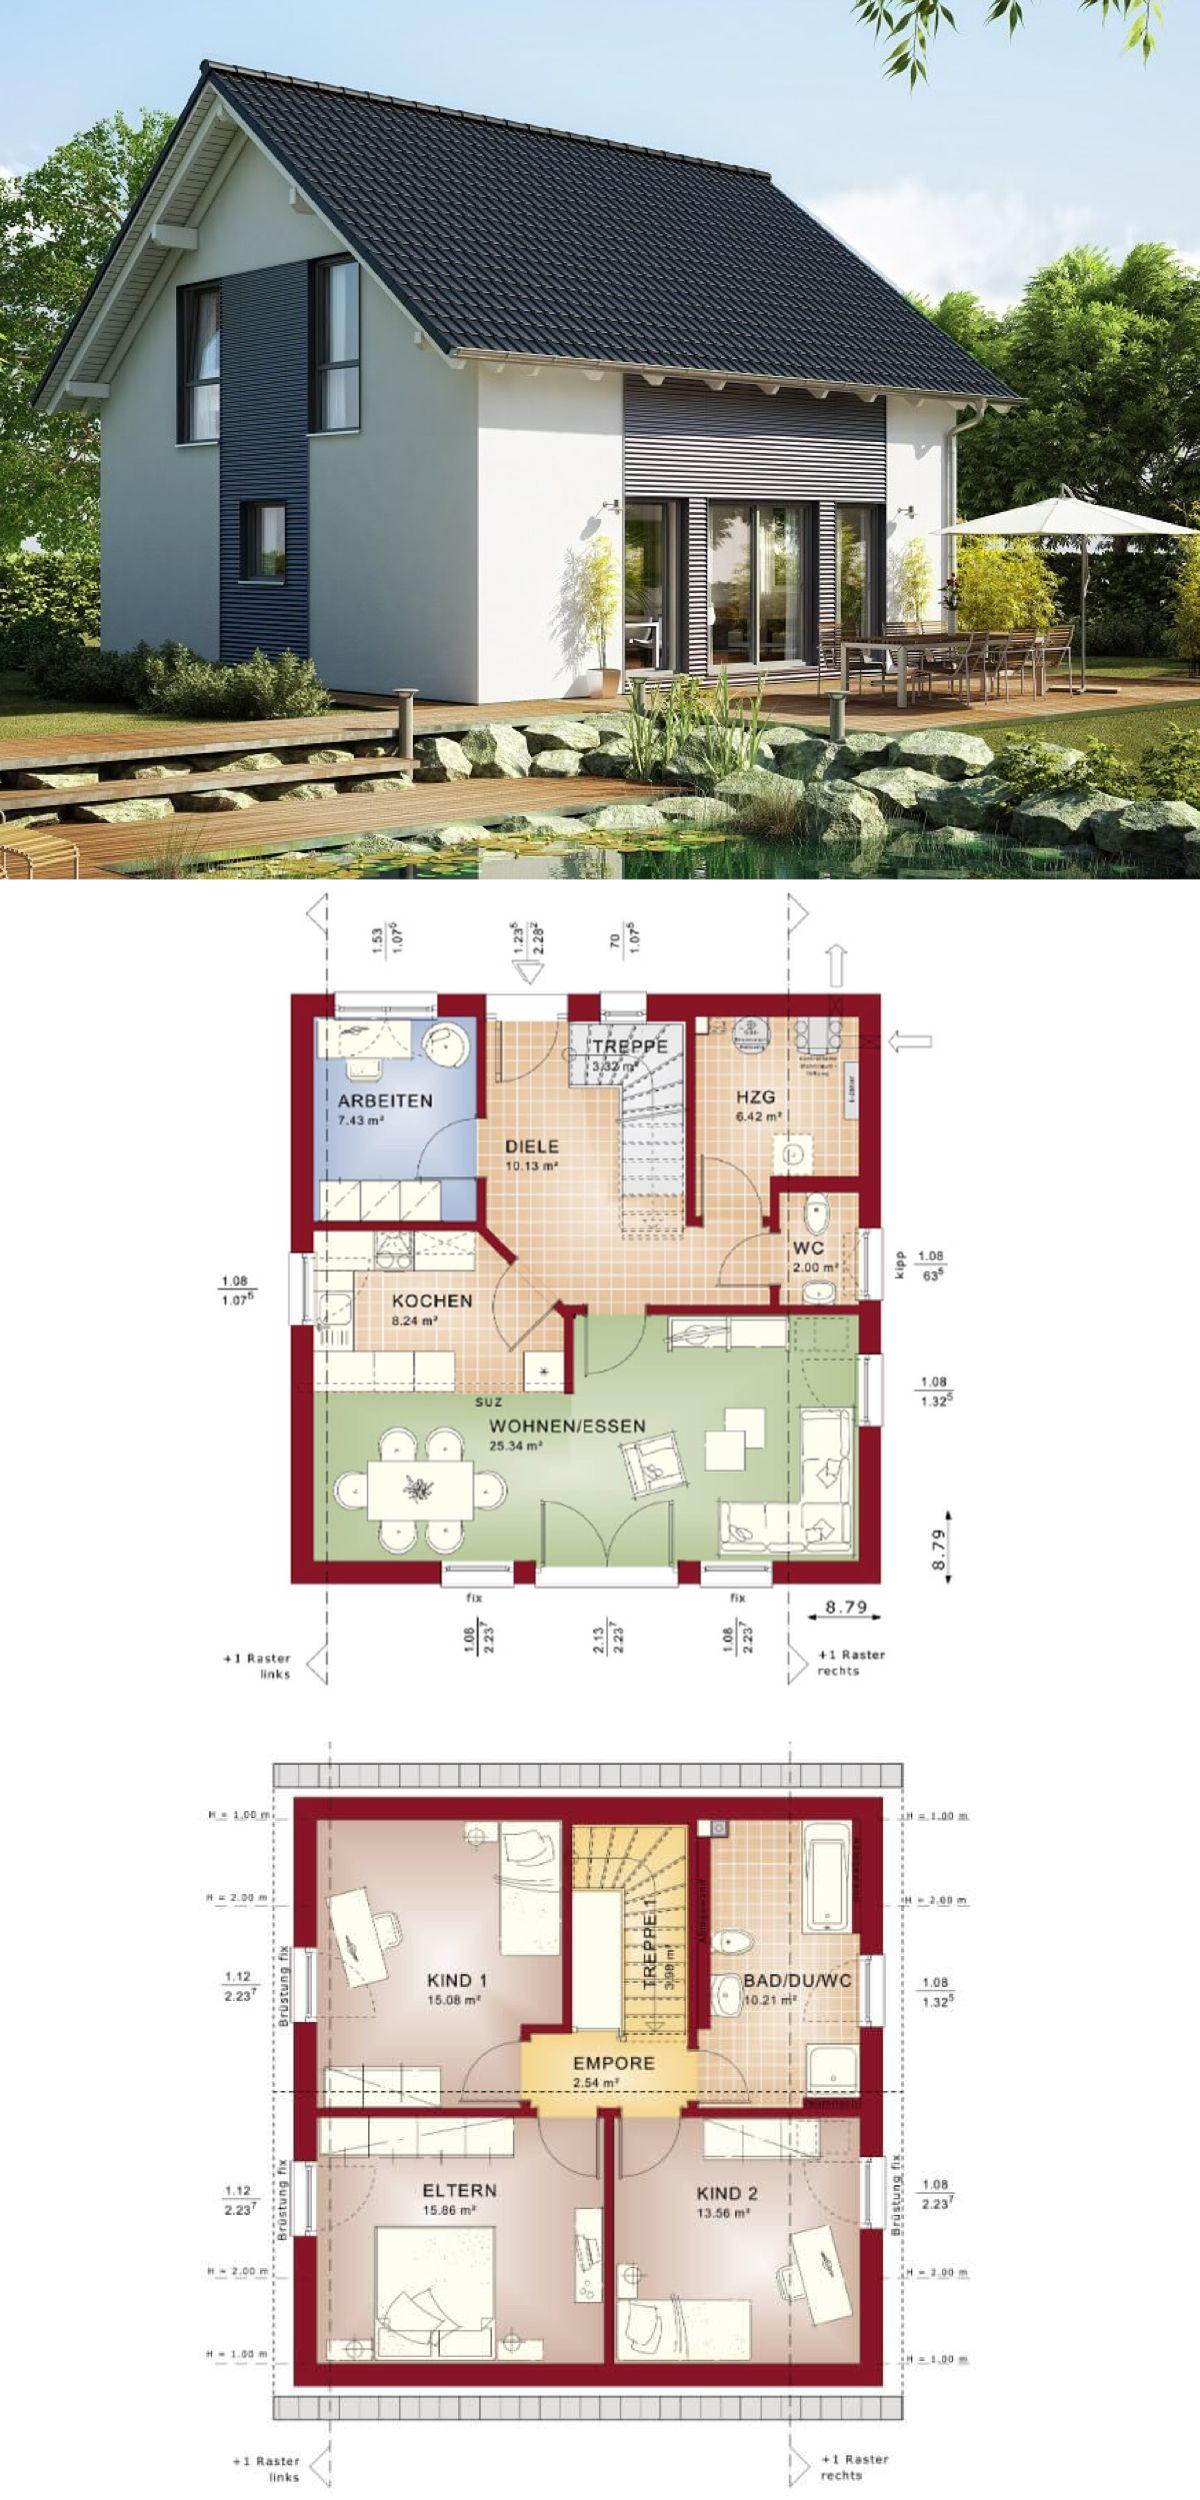 einfamilienhaus celebration 125 v1 bien zenker fertighaus bauen satteldach grundriss modern 5 zimmer offene - Fertighausplne